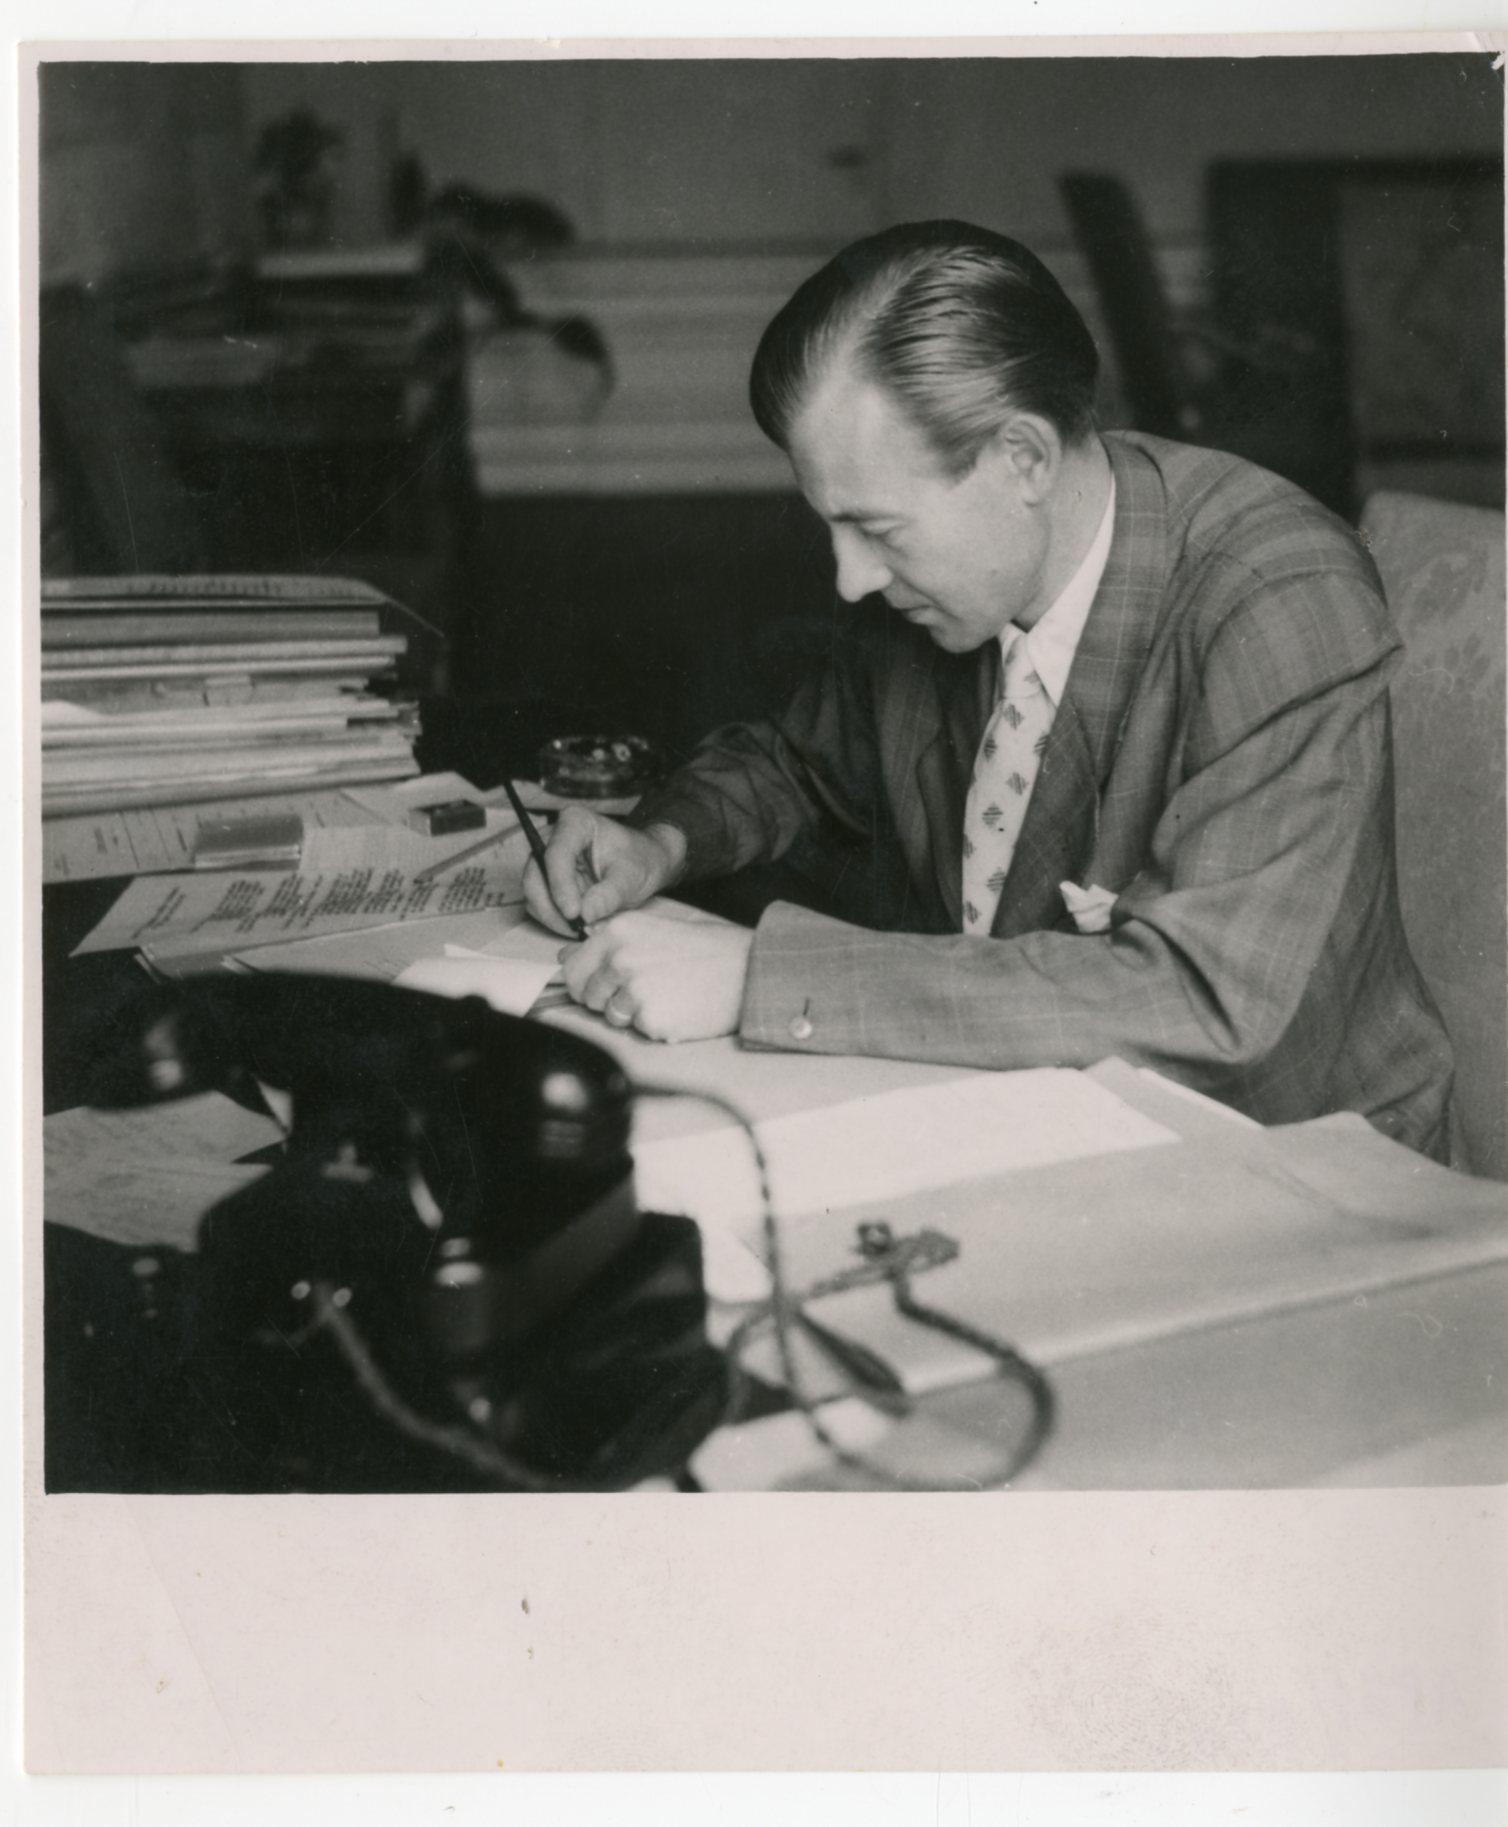 Mojmír Vaněk at the presidential office of Edvard Beneš